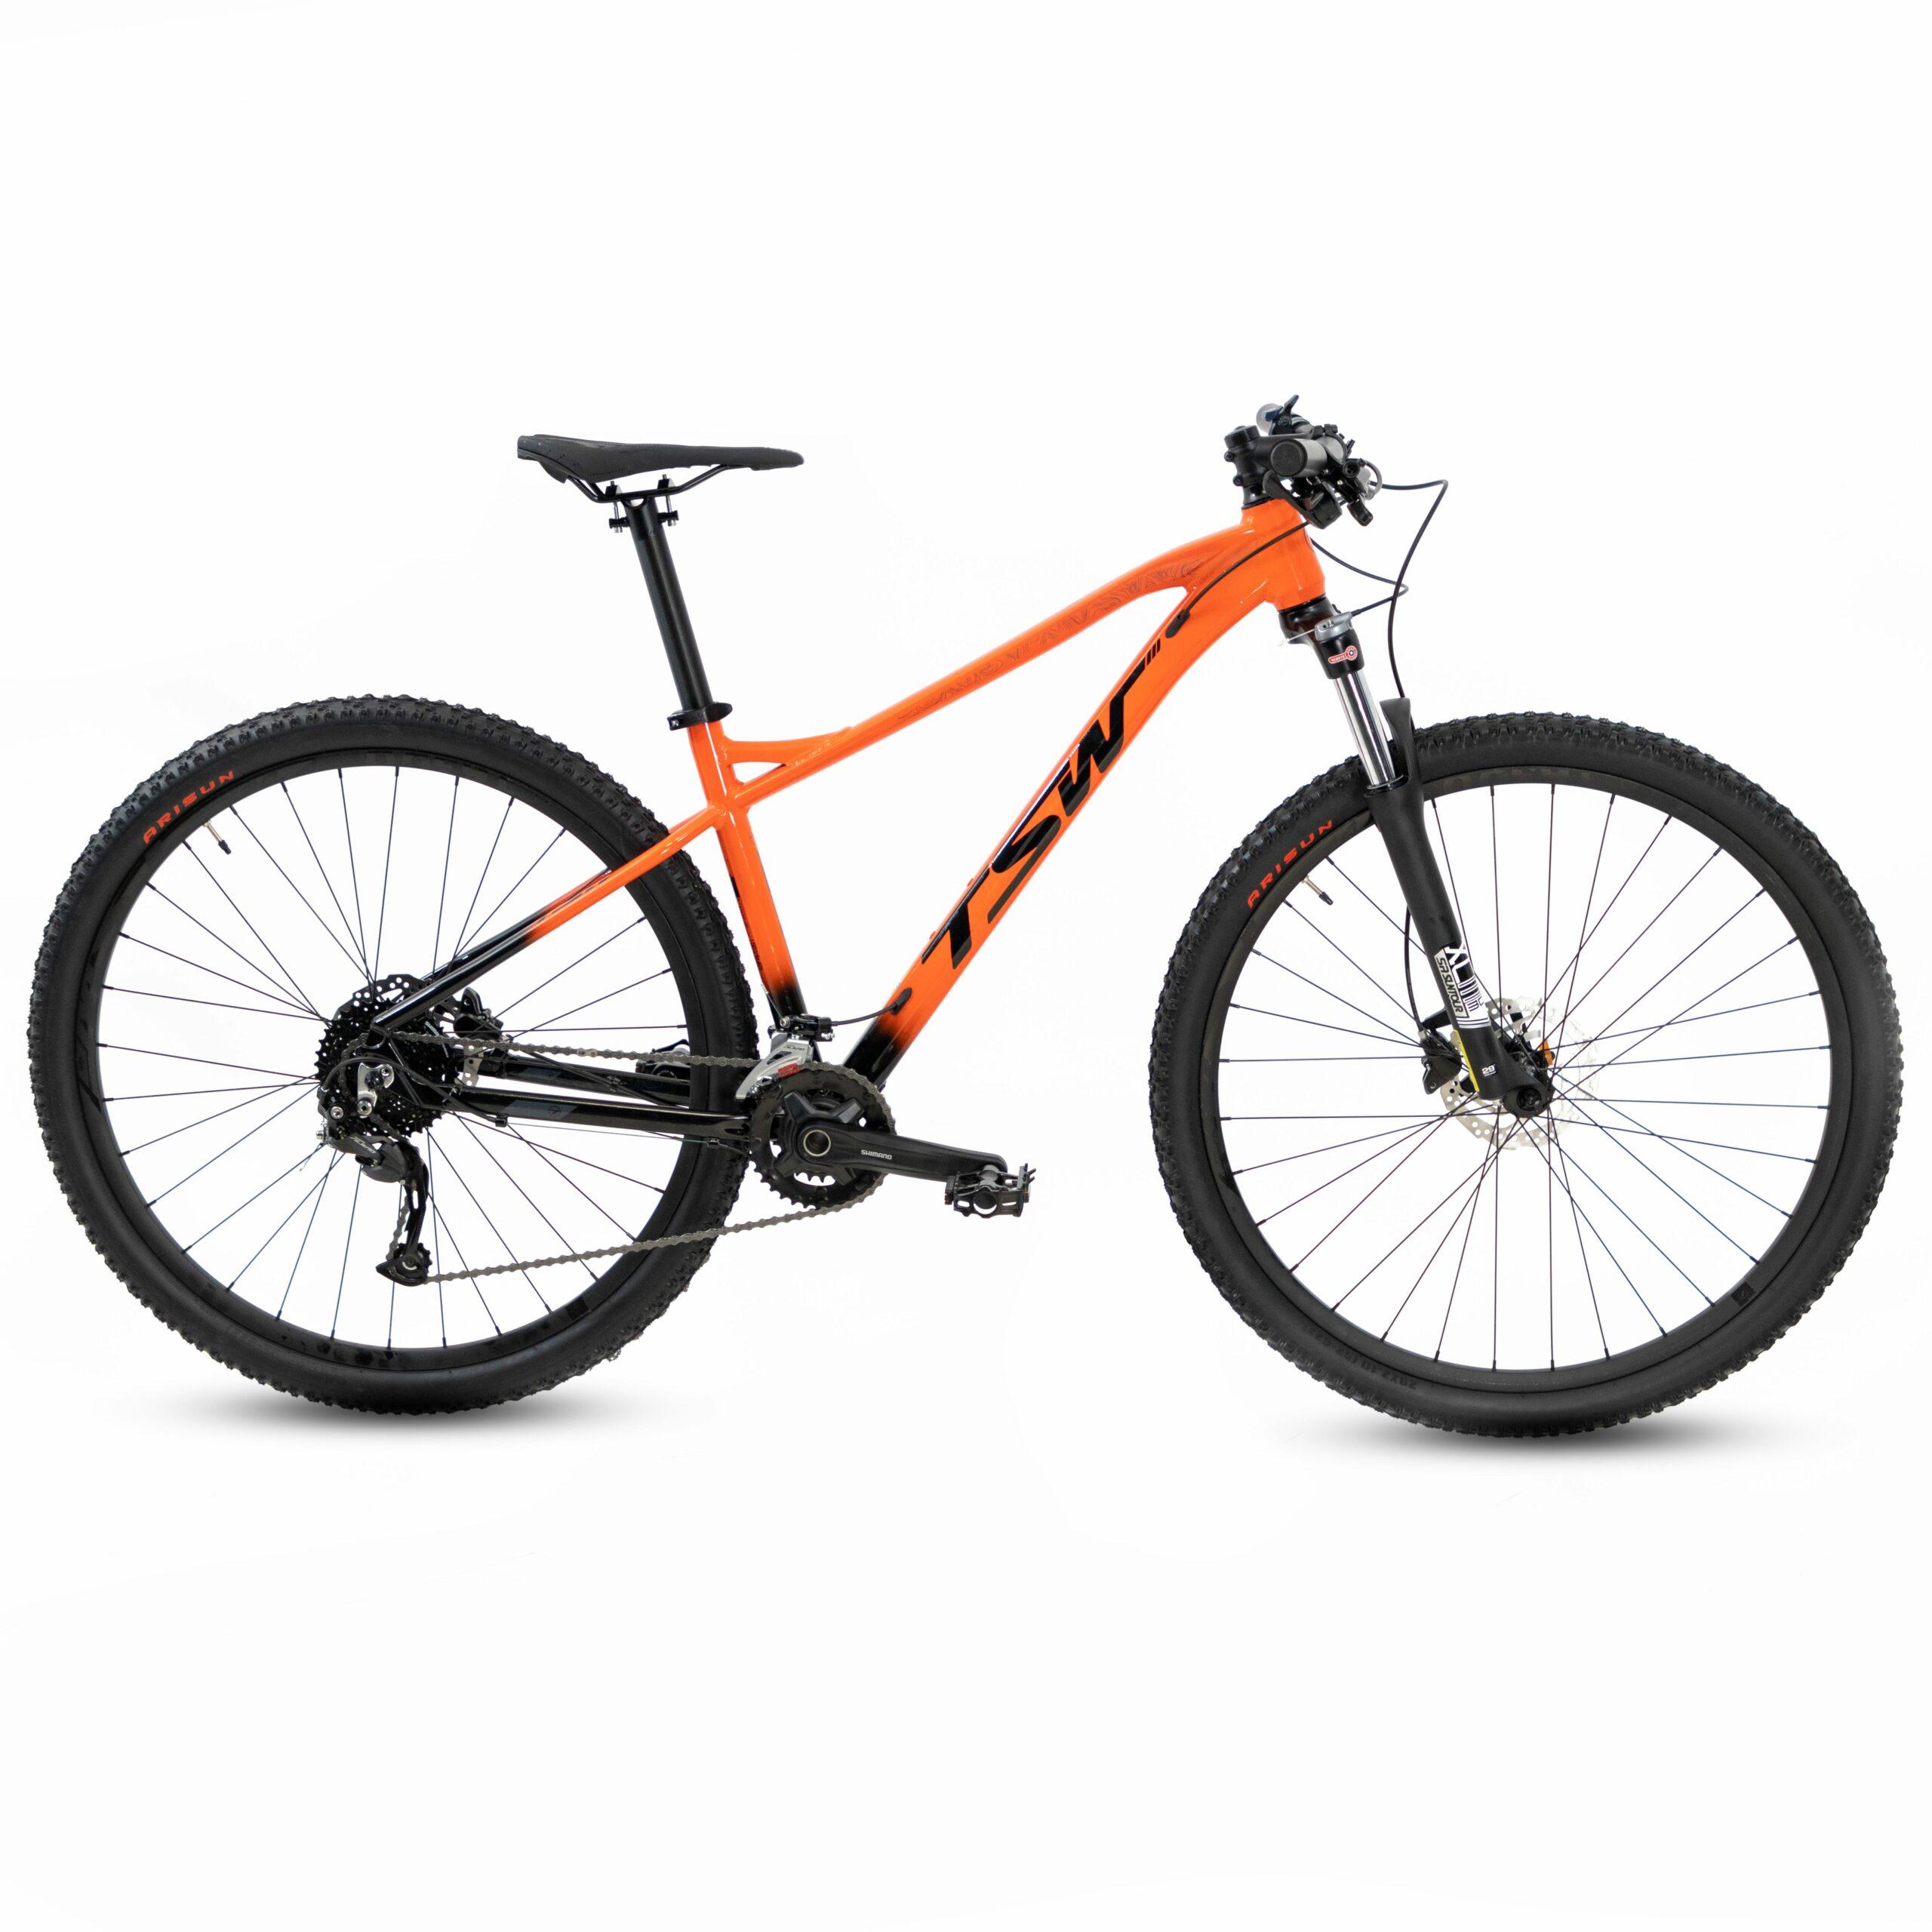 Bicicleta TSW Stamina | 2021/2022 4